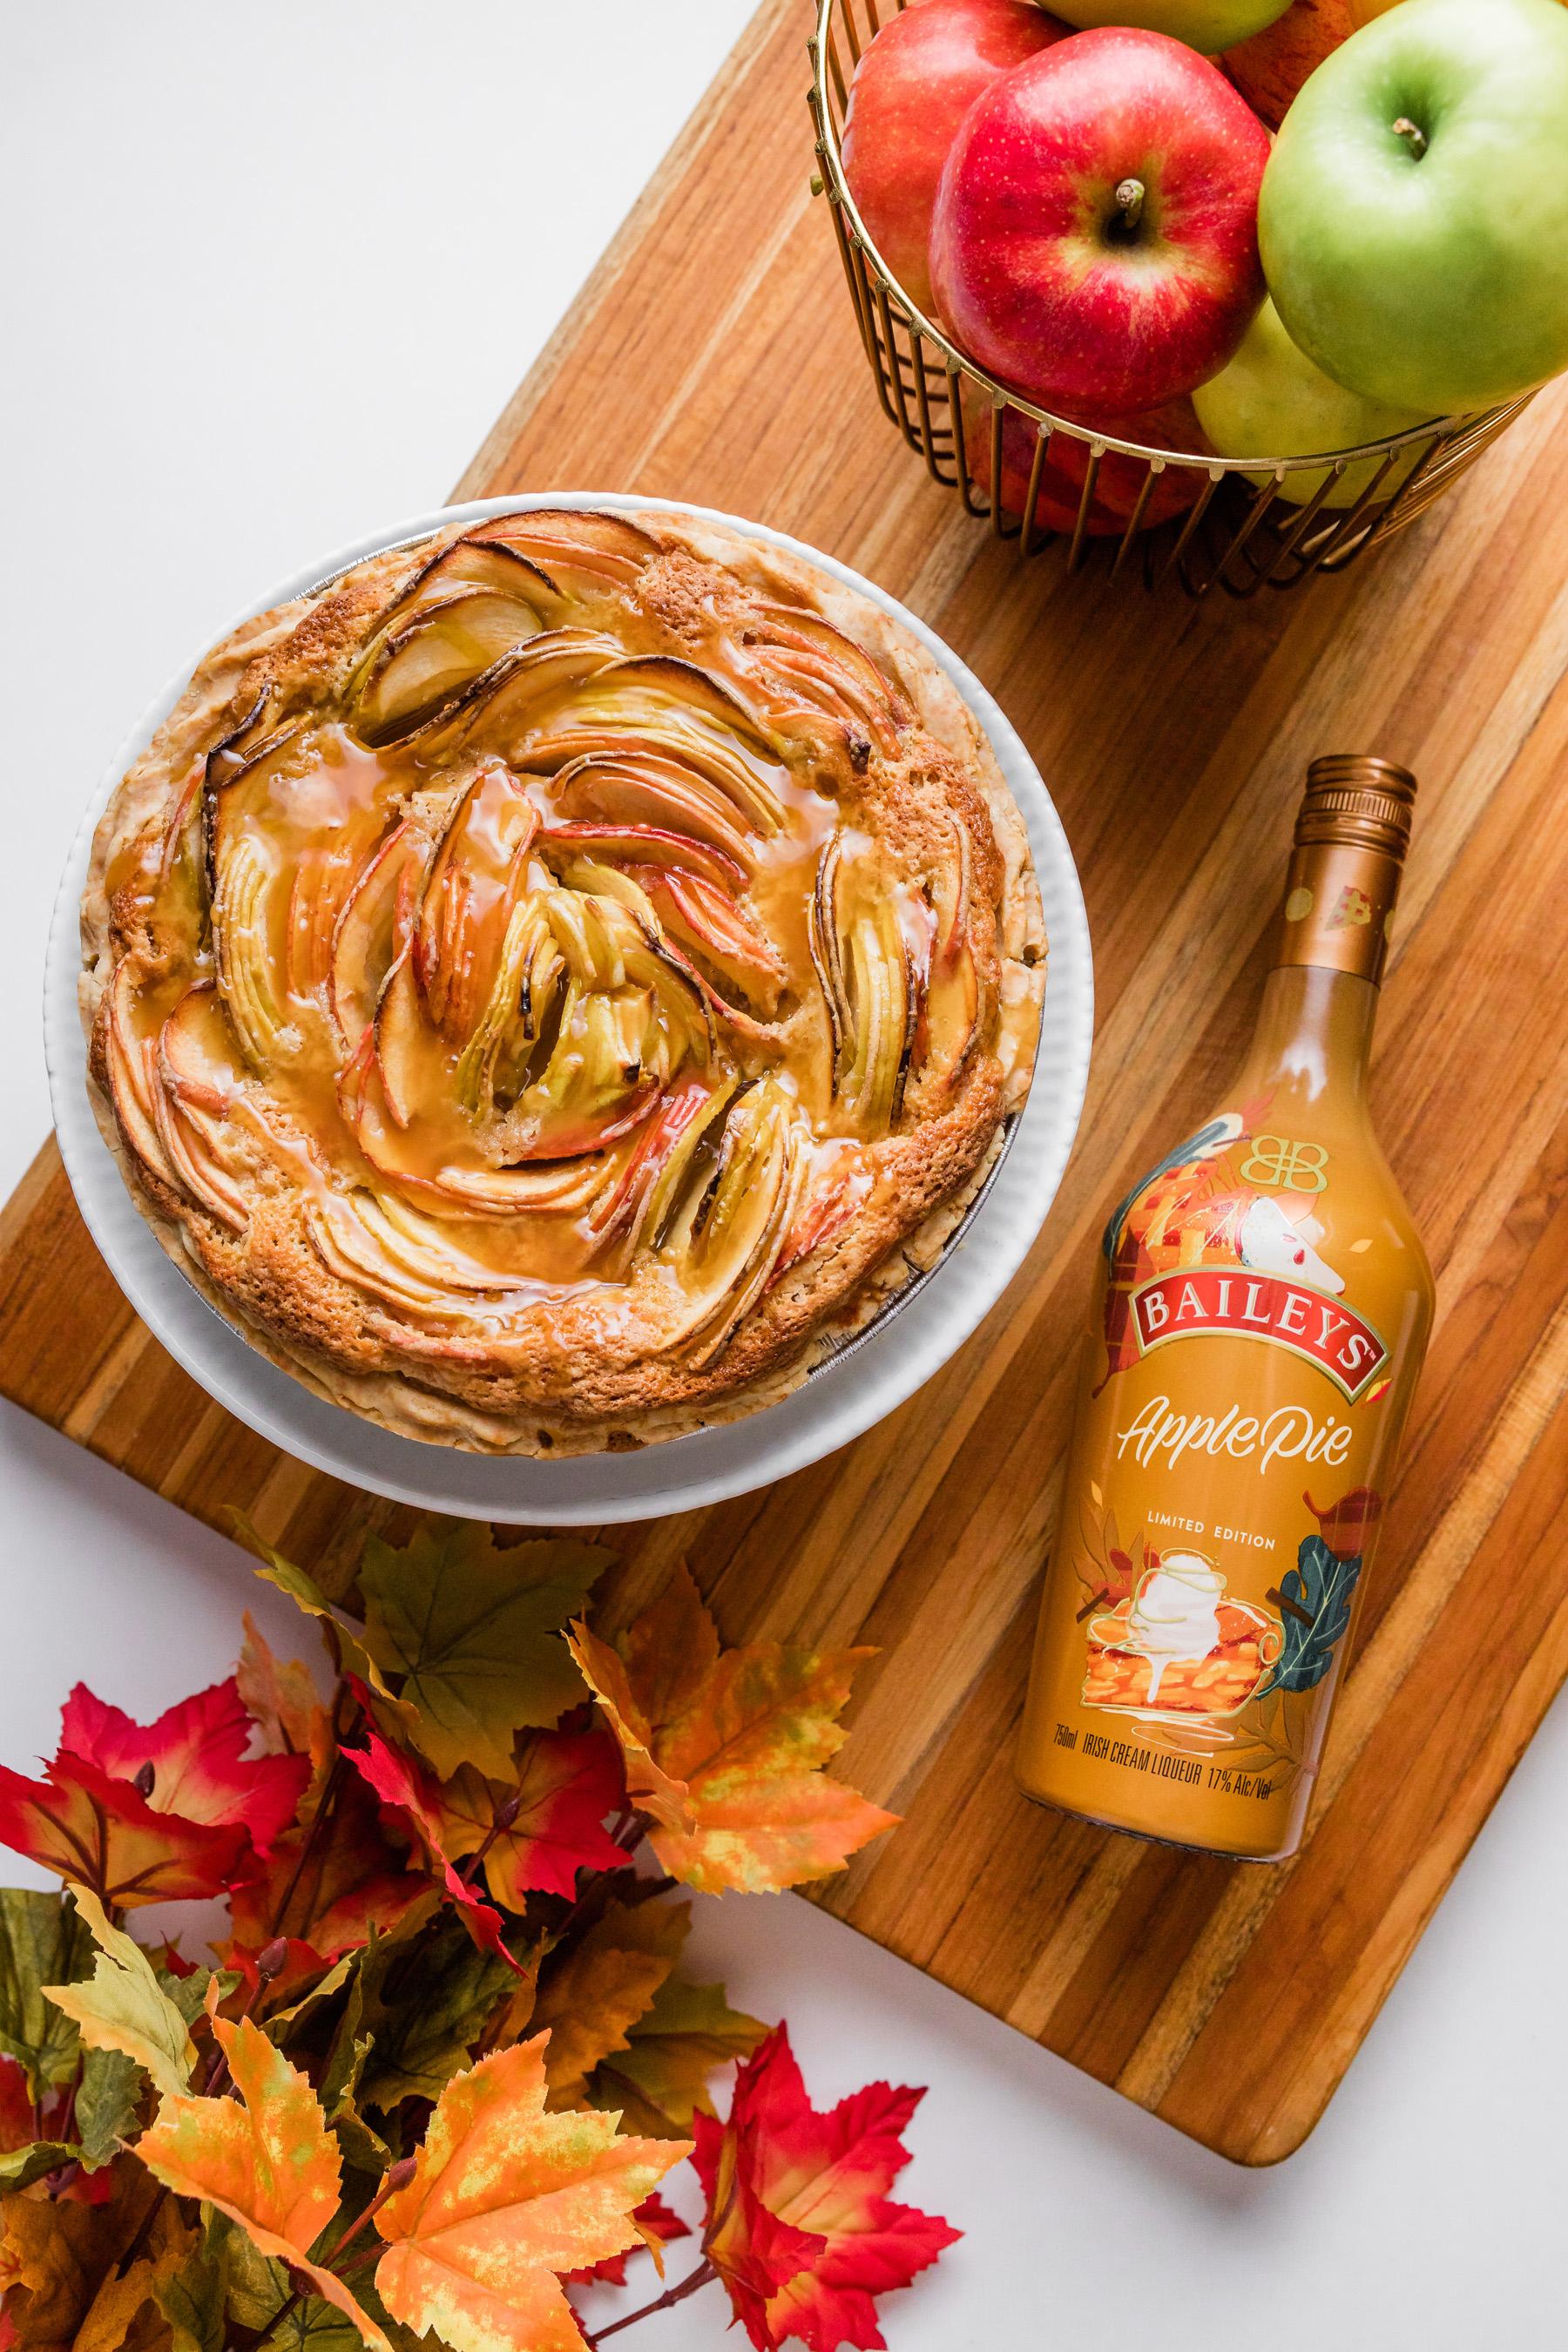 Justice of the Pies, Cobblestone Baileys Apple Pie